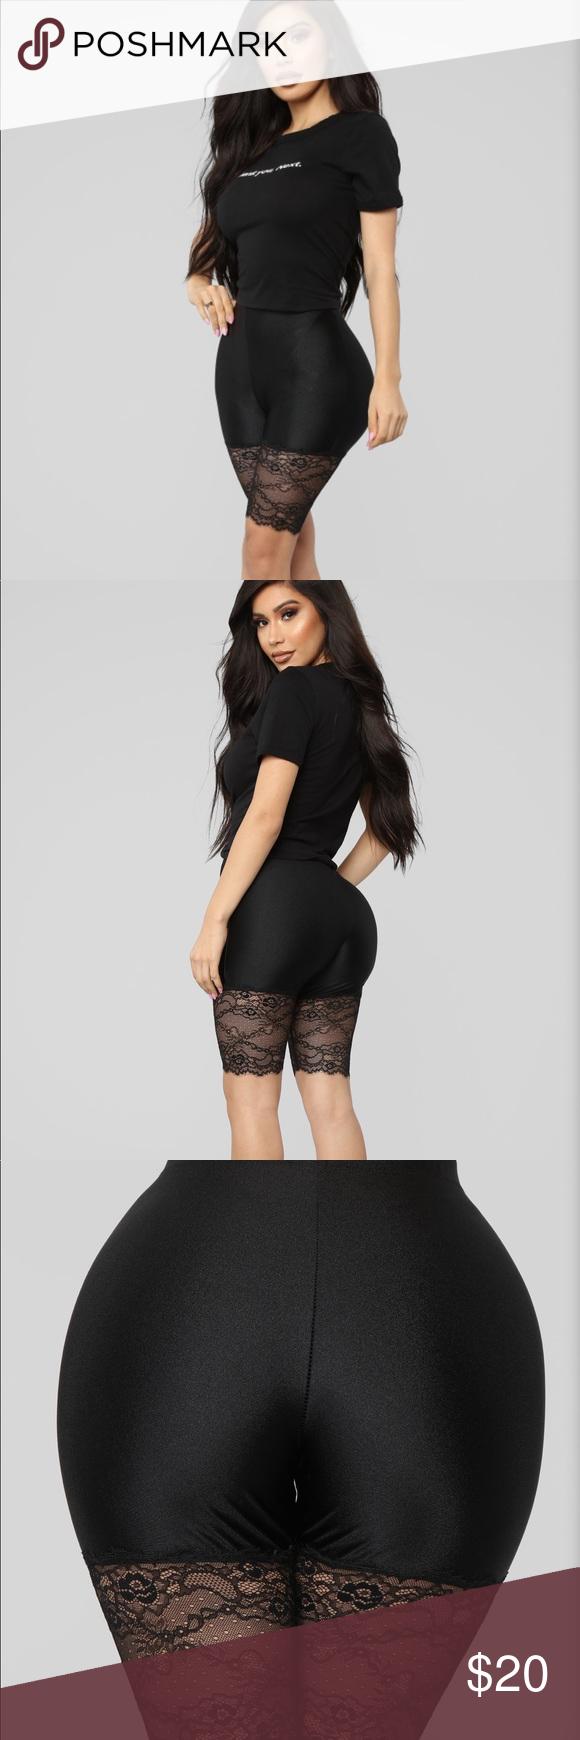 NWT fashion nova lace biker shorts size L New with tags